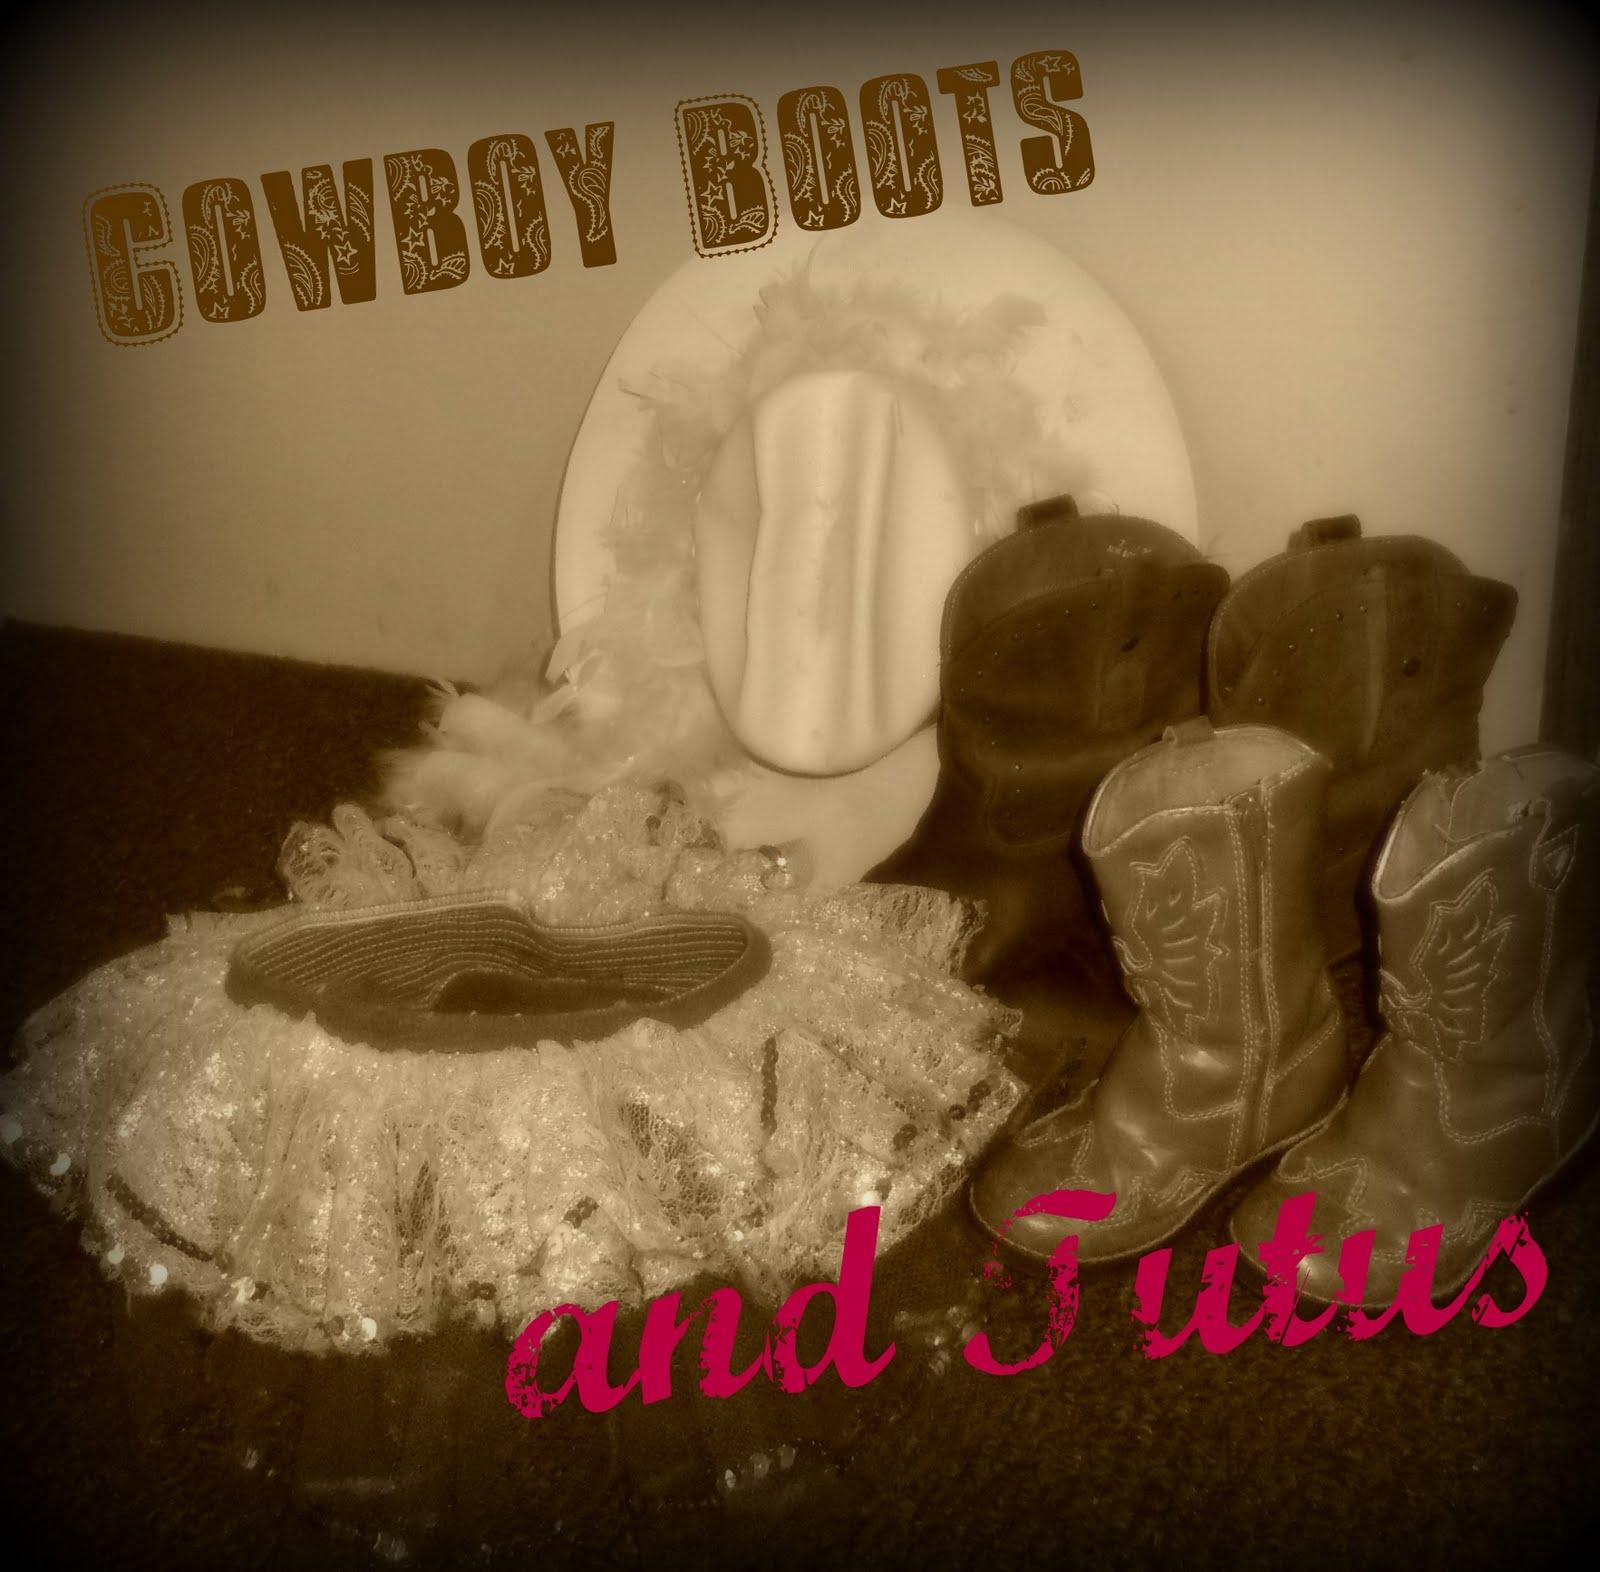 Cowboy Boots & Tutu's